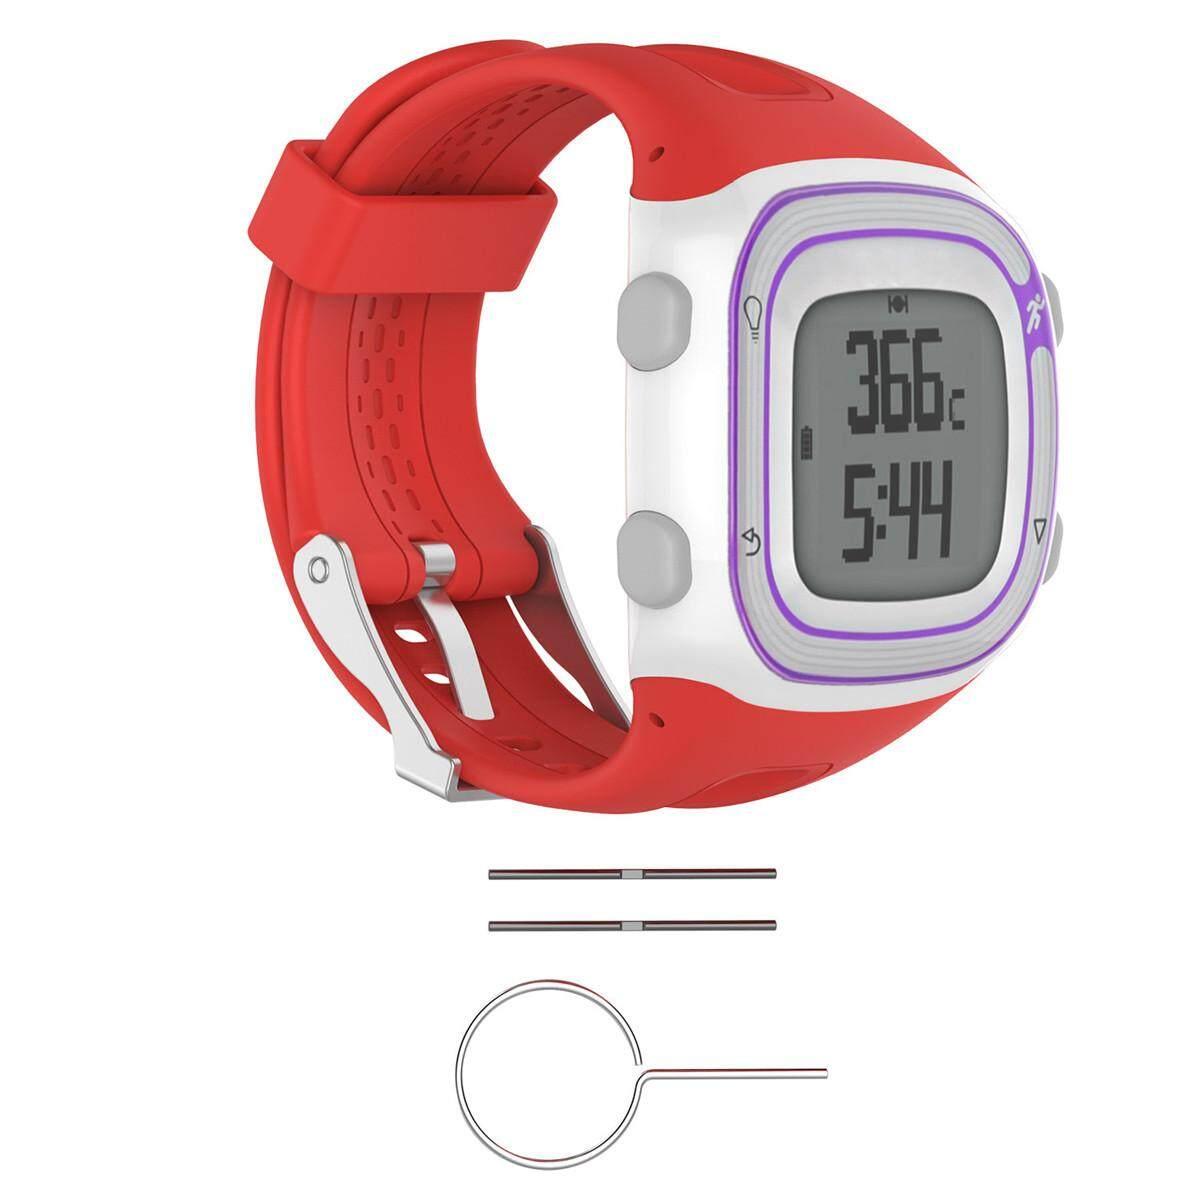 Hình ảnh Watch Silicone Wrist Band Strap +Tools For Garmin Forerunner 10 / 15 GPS Running #red men